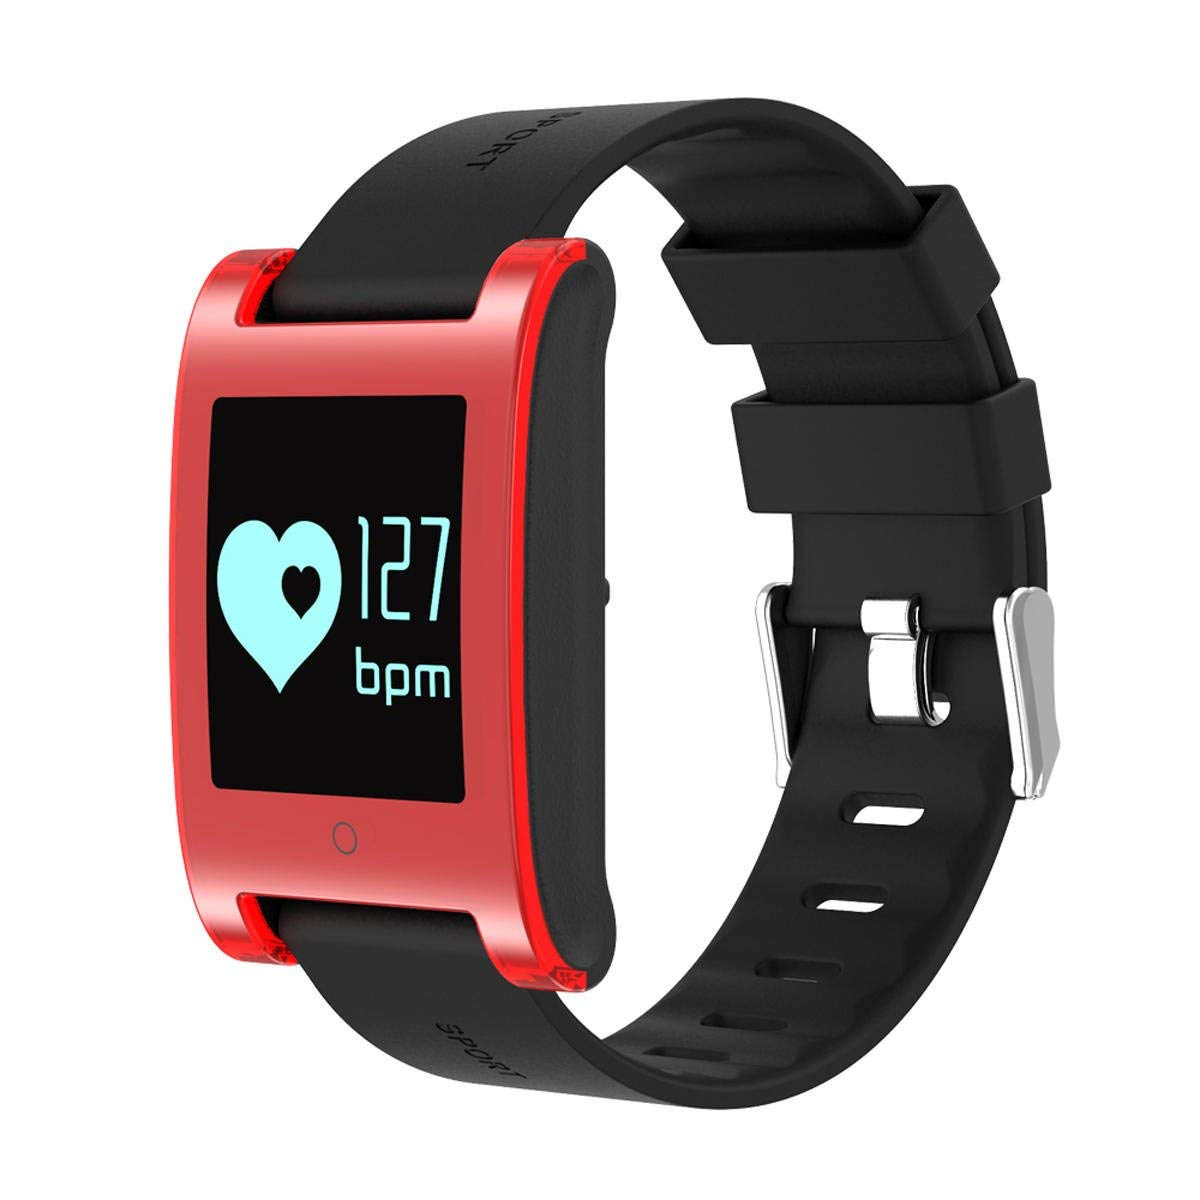 Waterproof Bluetooth Bracelet - Bluetooth Sport Bracelet - Dm68 Ip67 Waterproof Fitness Tracker Blood Pressure Heart Rate Monitor For Android & Ios - Red (Bluetooth Wireless Smart Bracelet)